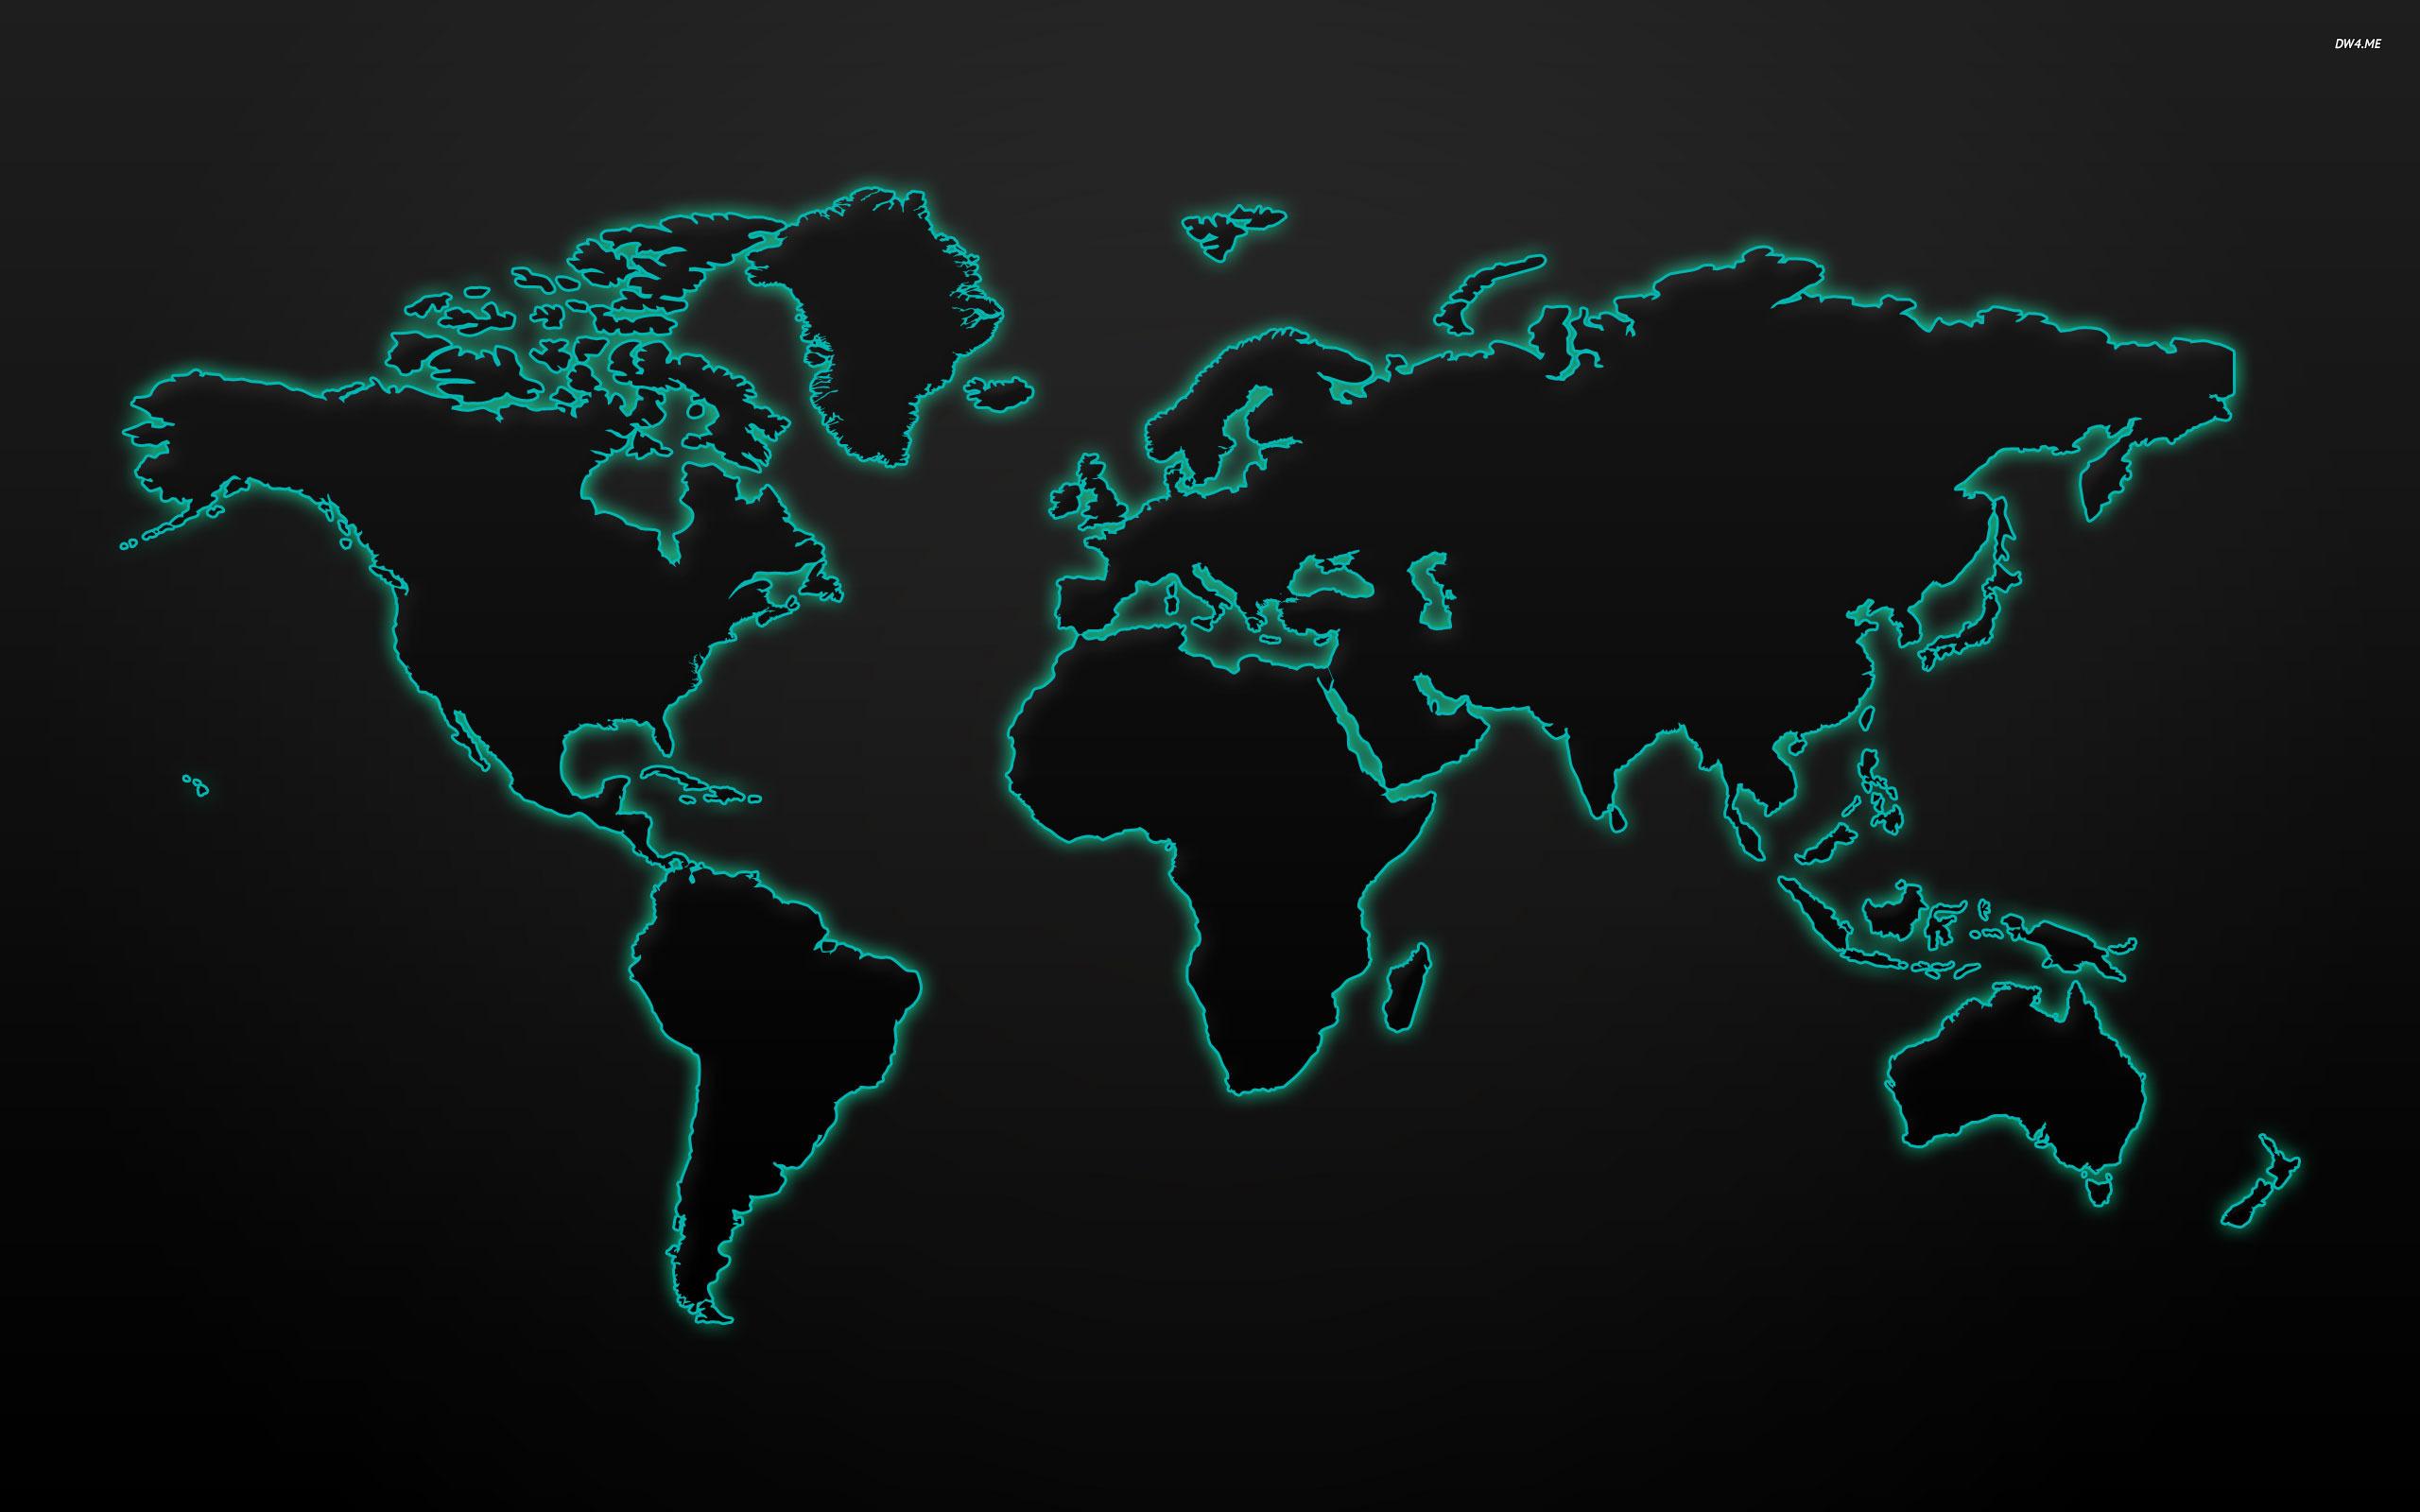 ... Glowing world map wallpaper 2560x1600 ...